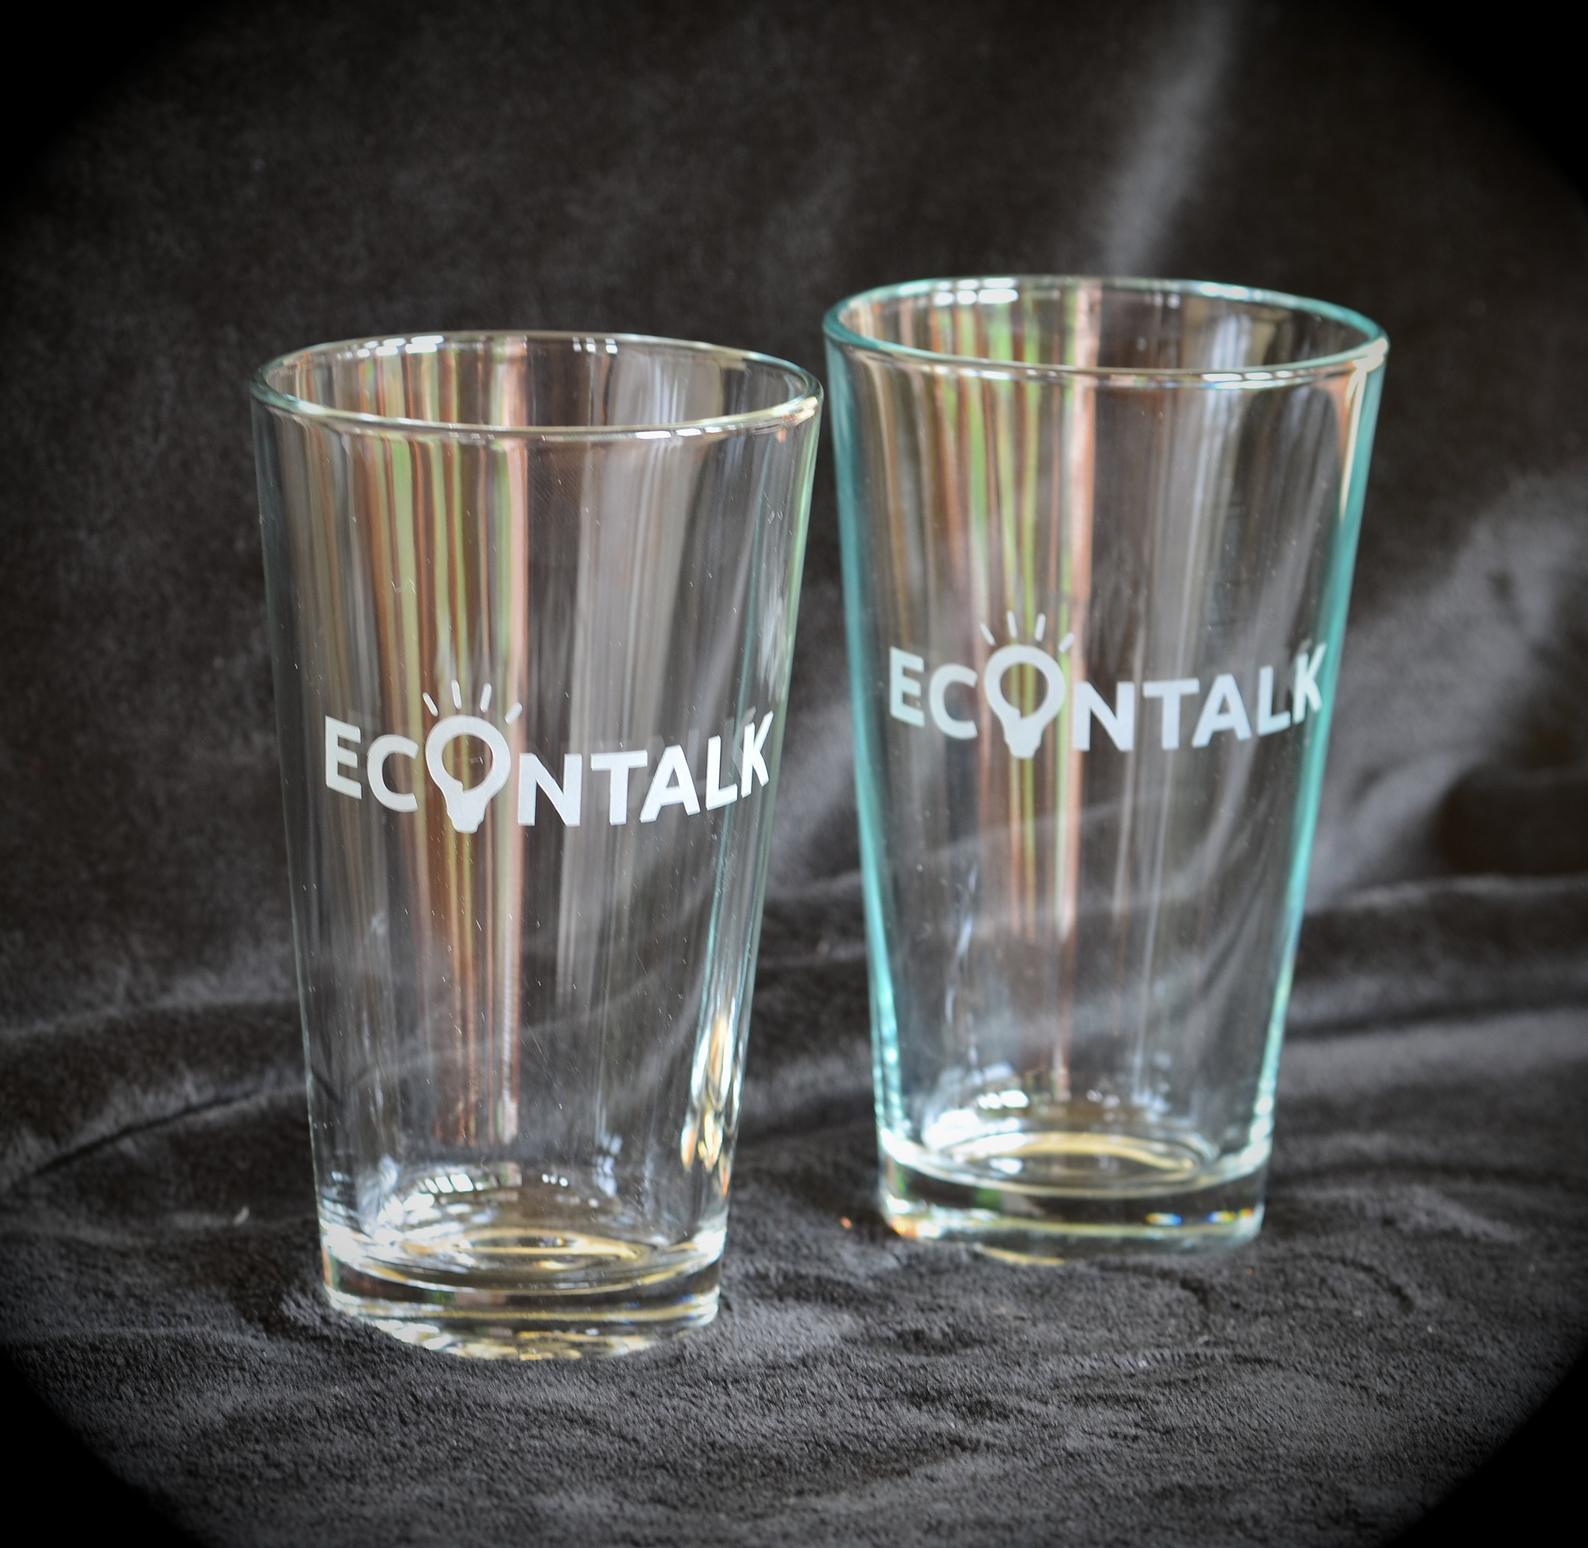 EconTalk Pint Glasses